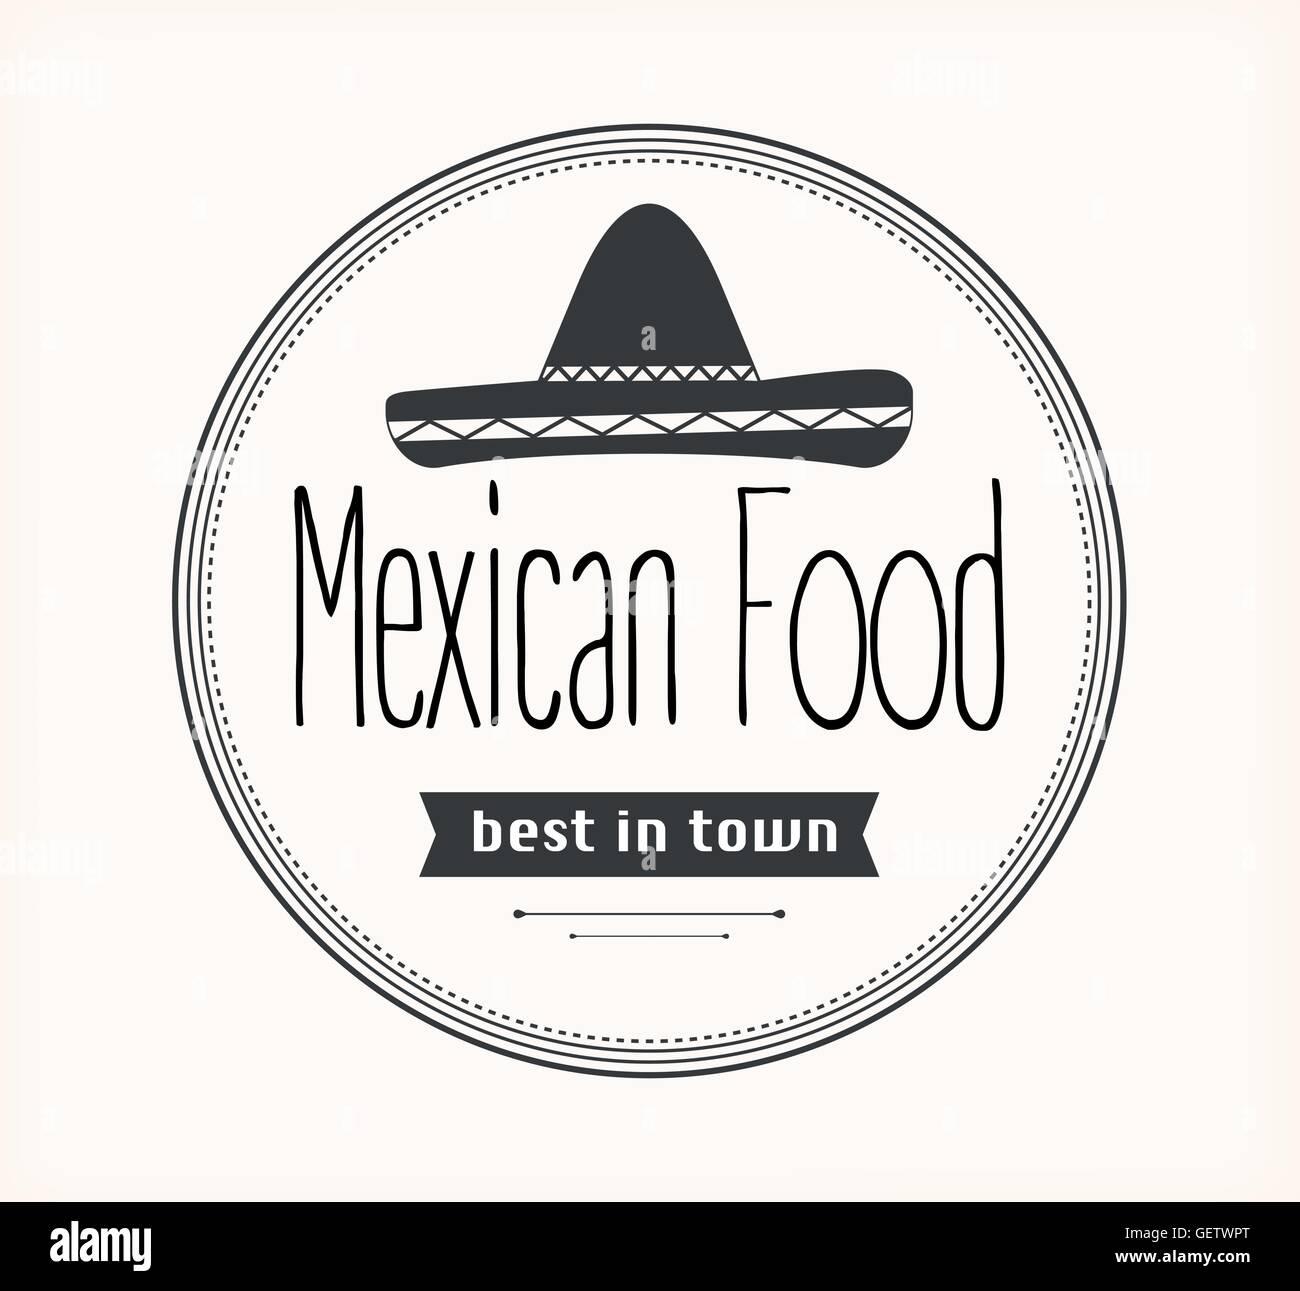 Mexican Food Logo Stock Vector Art Illustration Vector Image